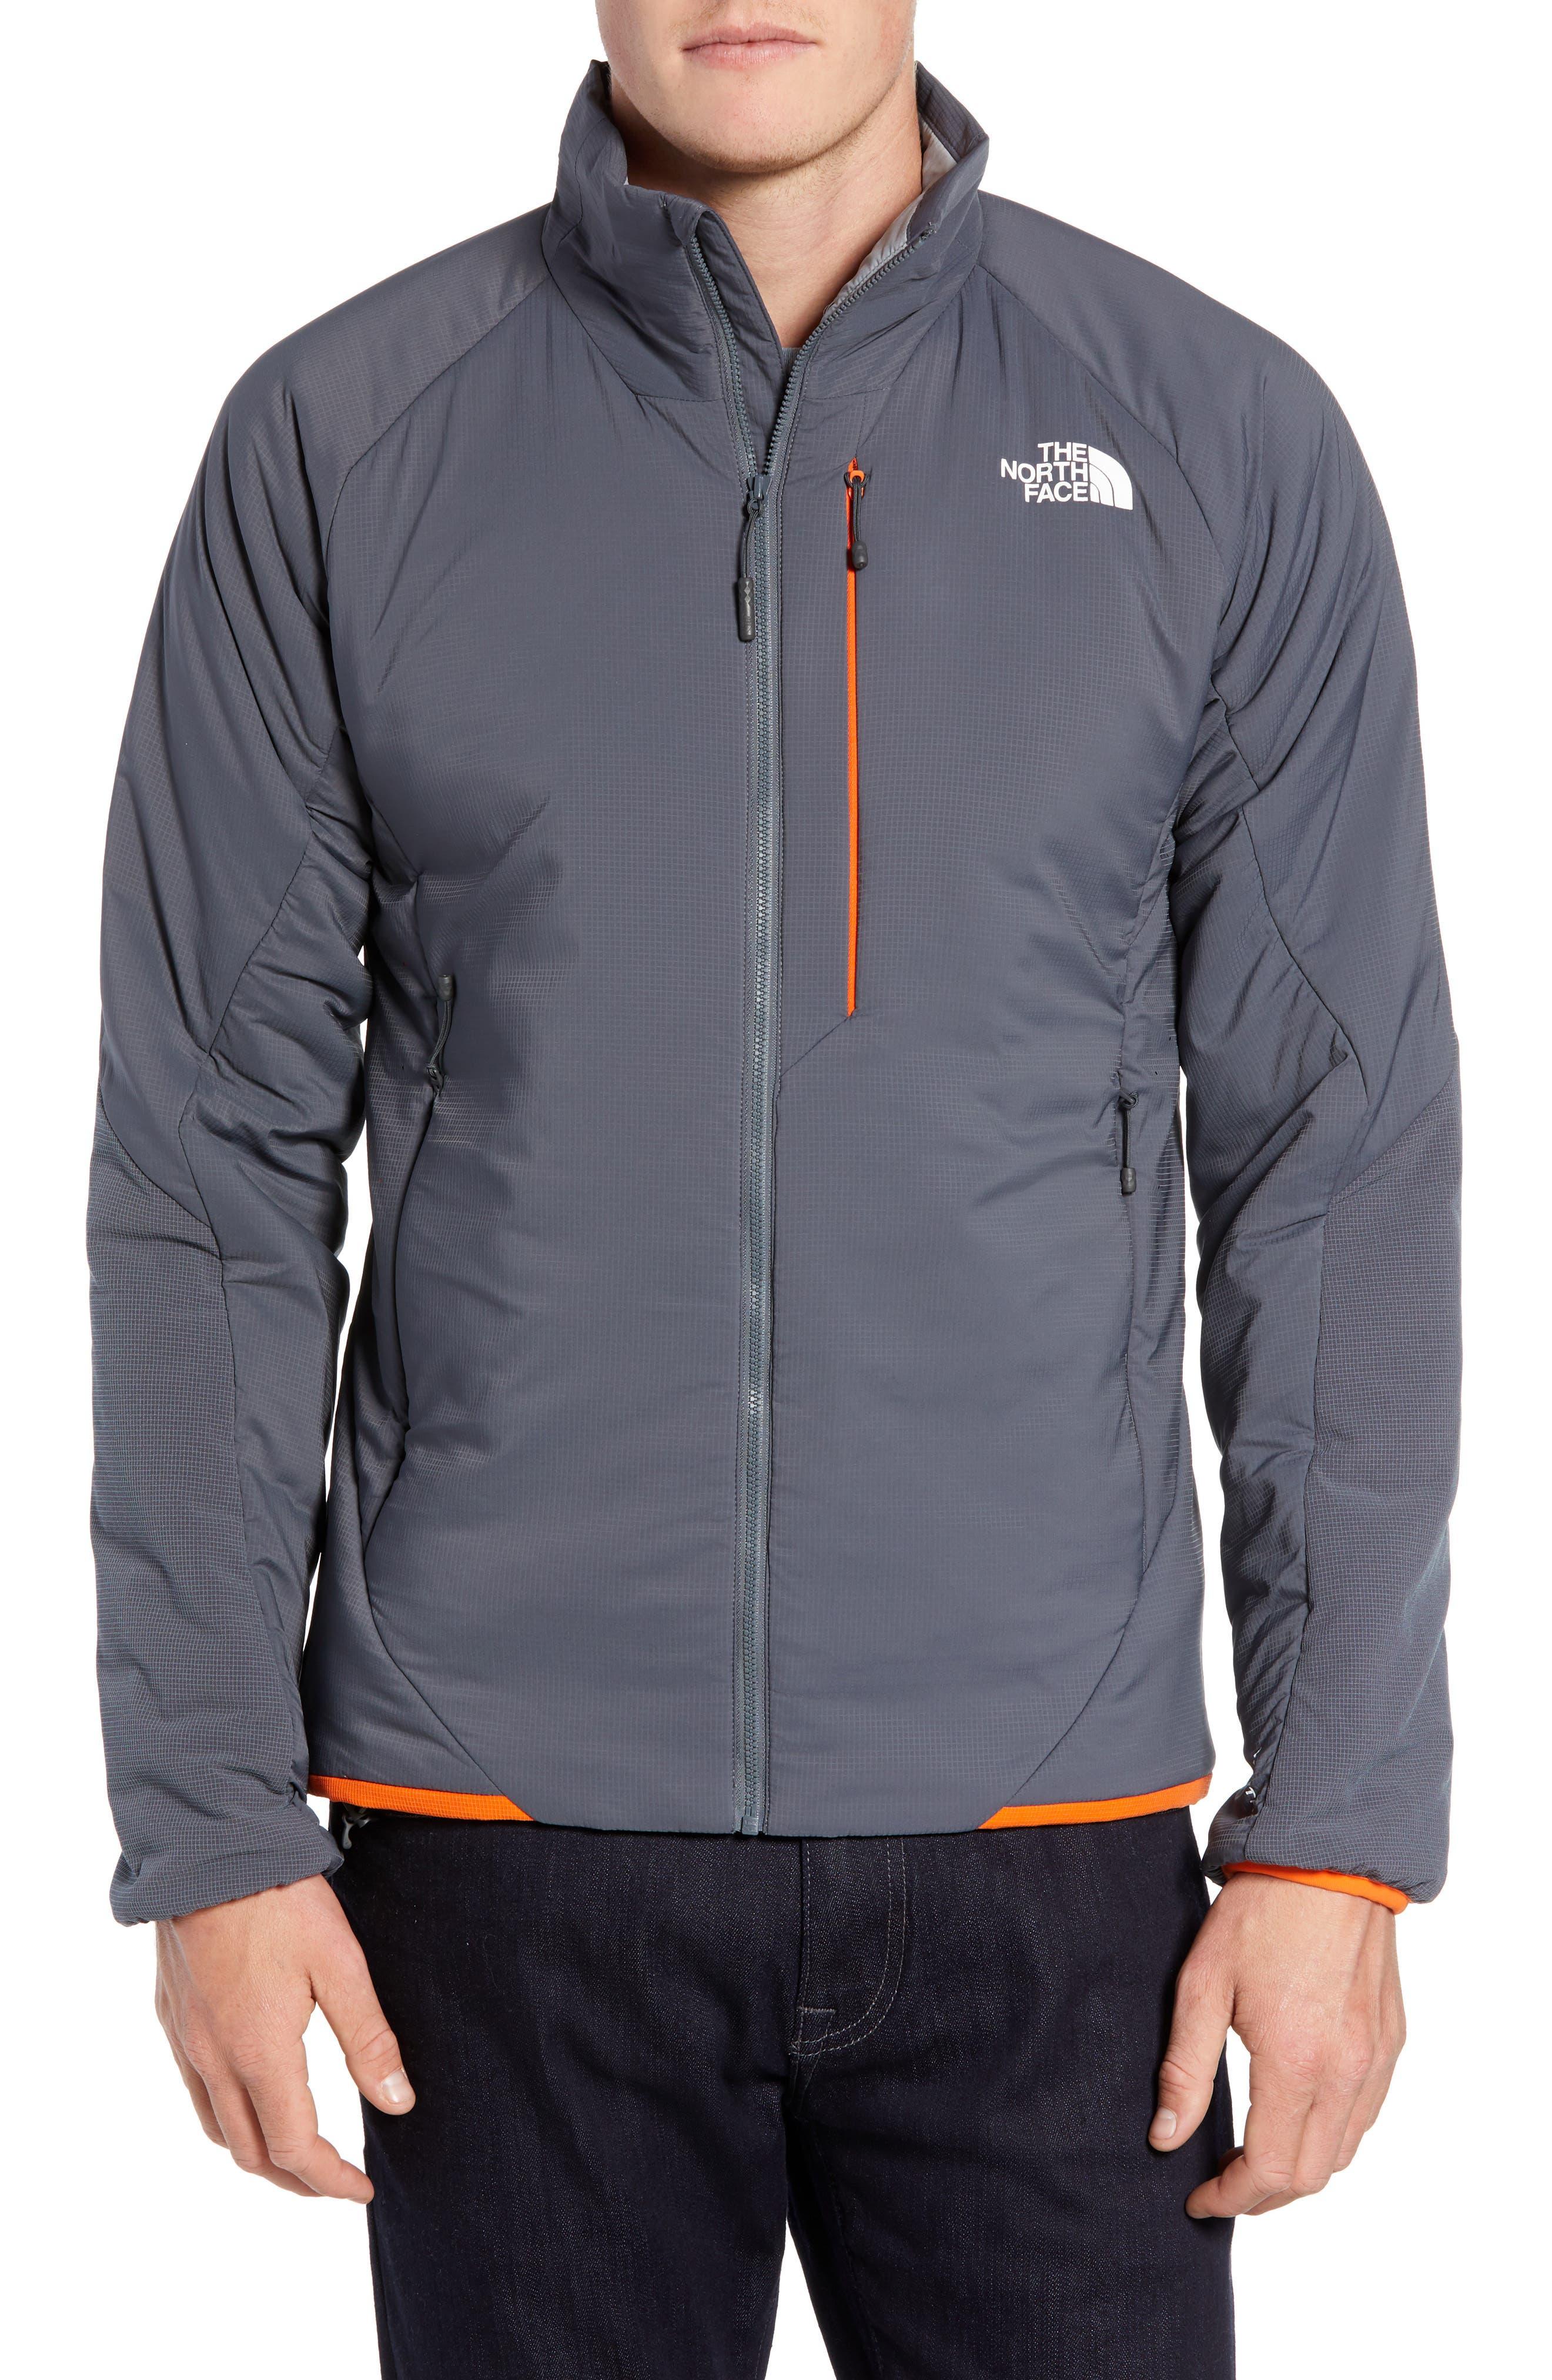 Ventrix Water Resistant Ripstop Jacket,                         Main,                         color, VANADIS GREY/ VANADIS GREY